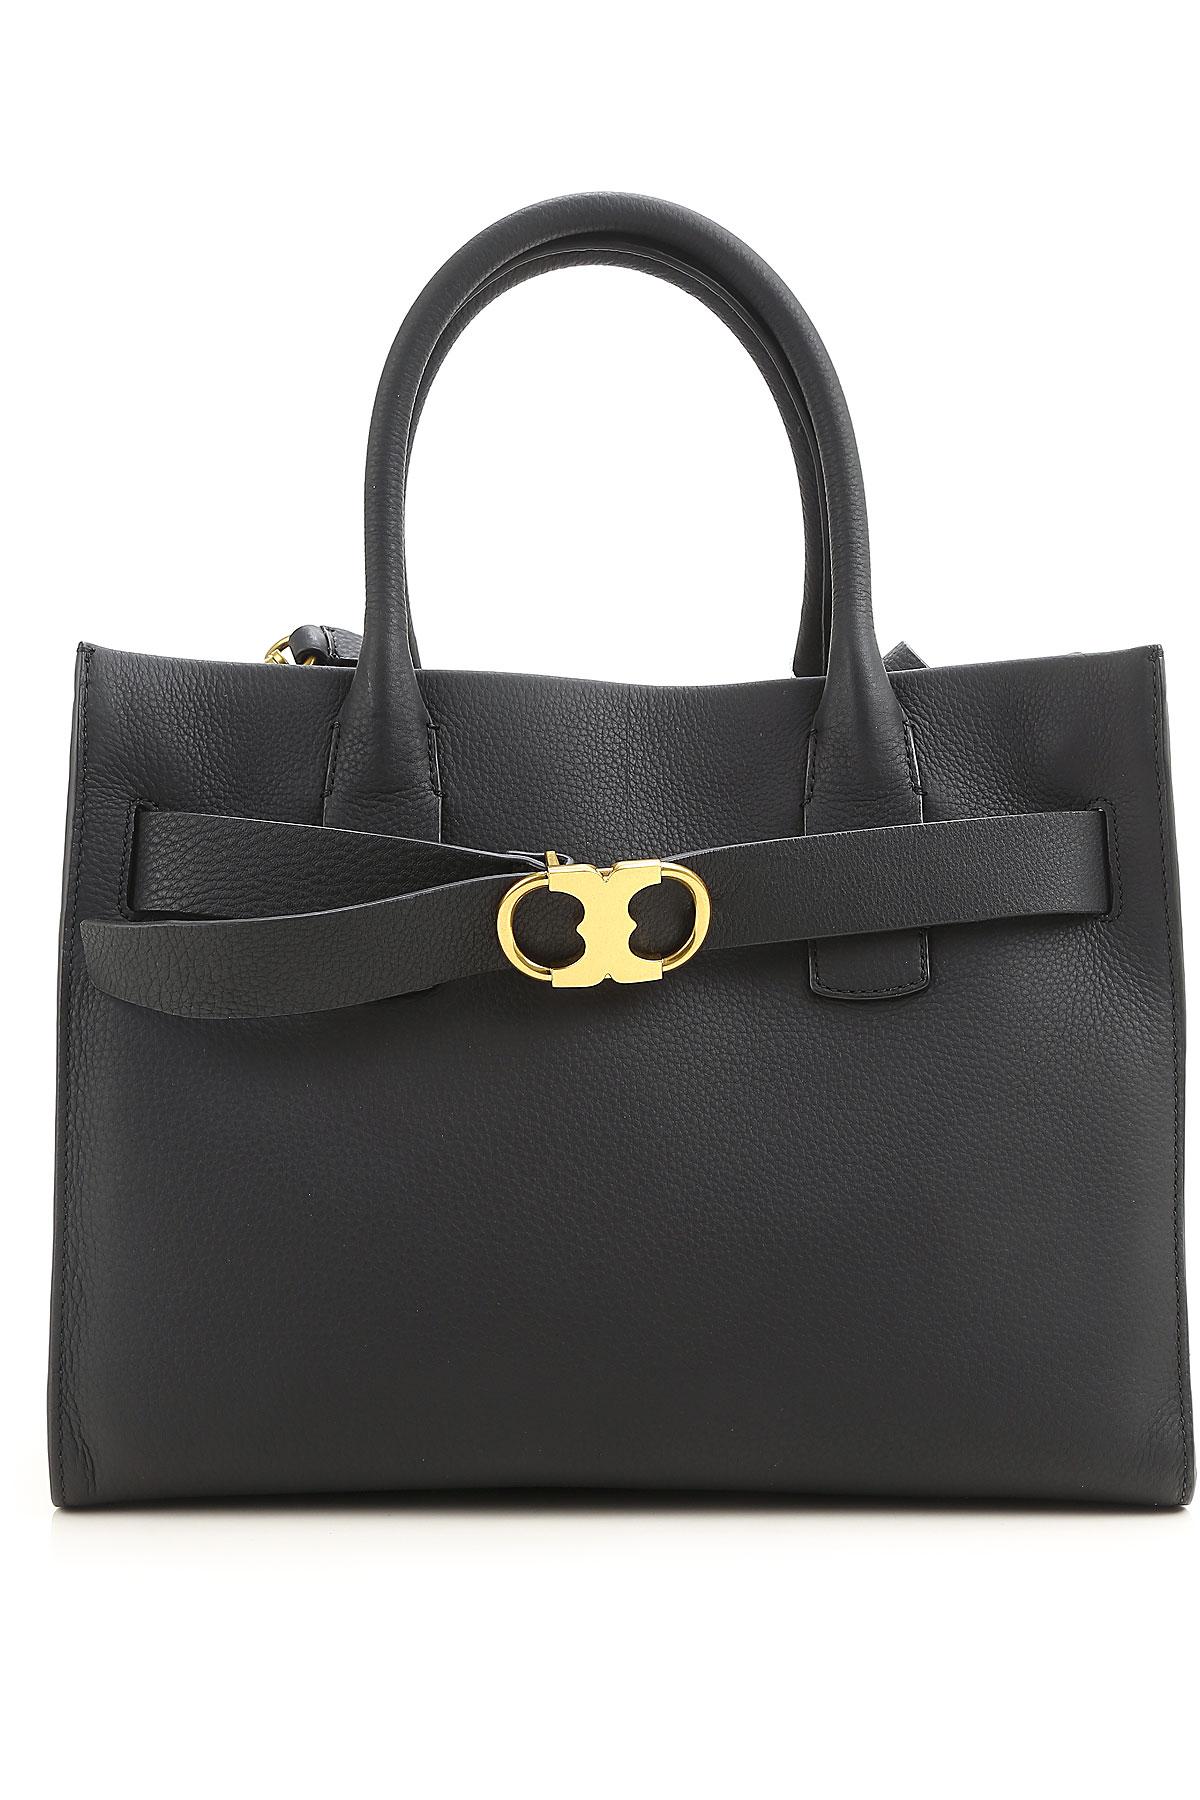 Tory Burch Tote Bag On Sale, Black, Leather, 2017 USA-417391